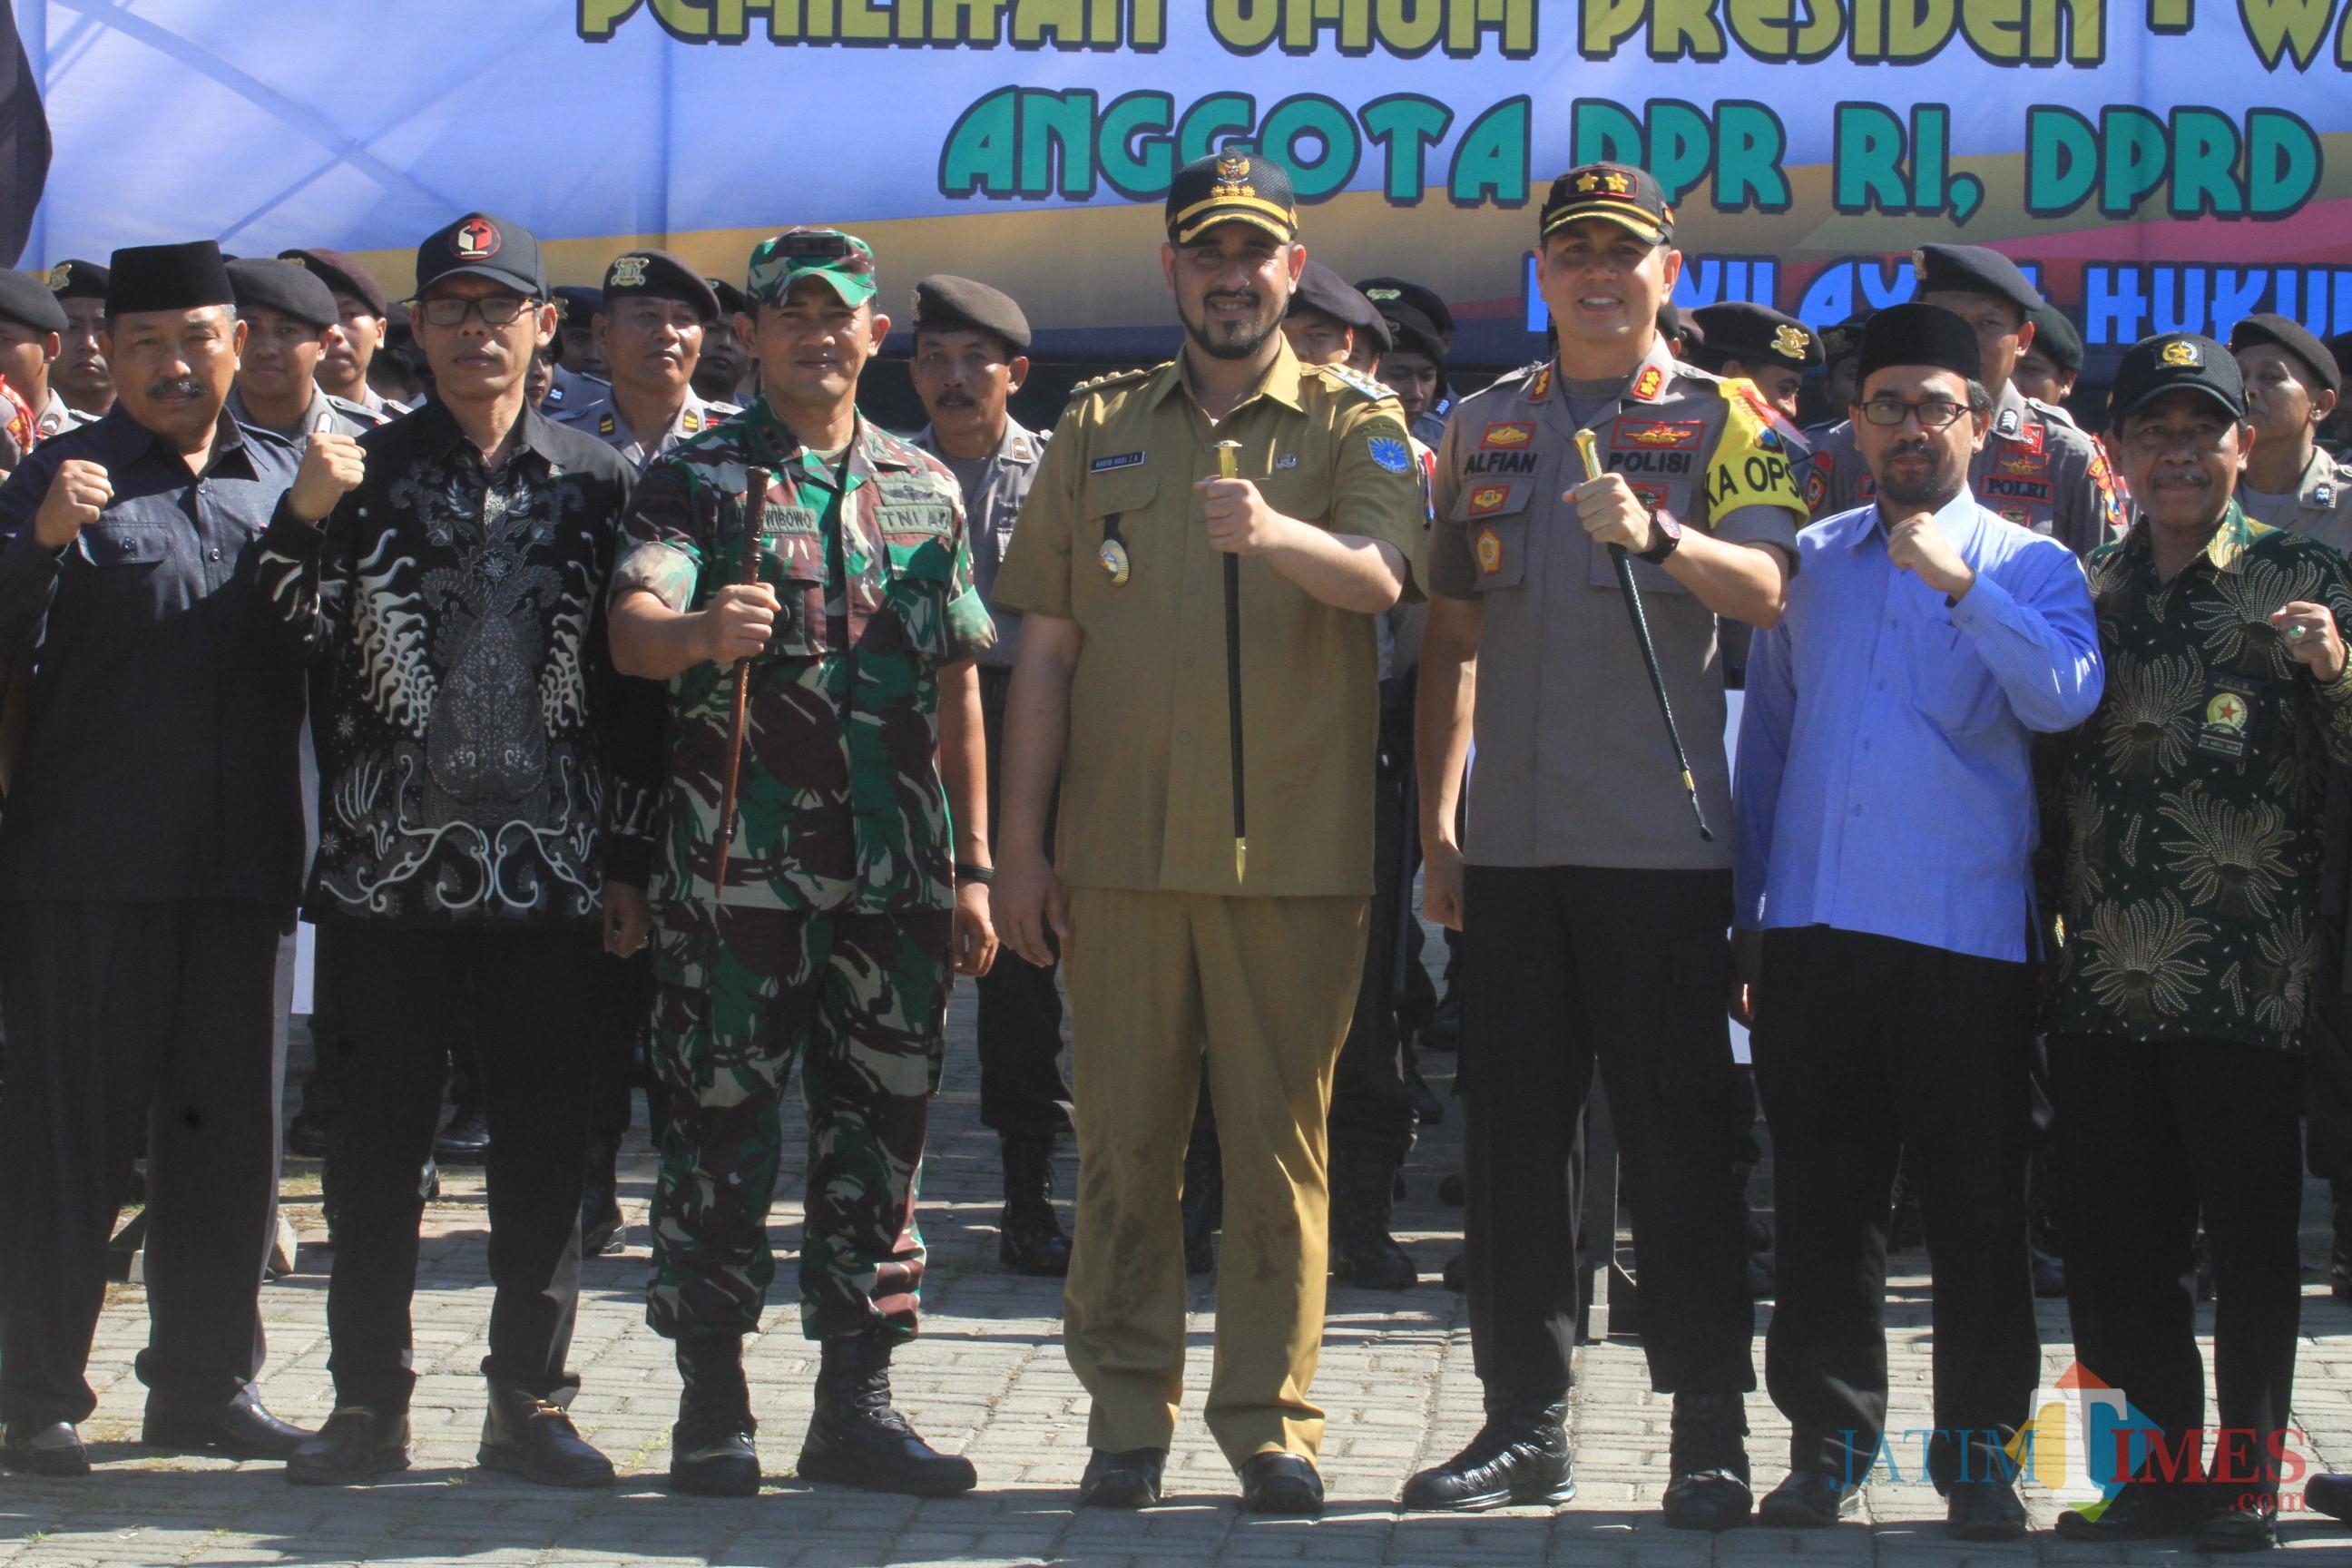 ketua FKUB Abdul Halim, paling kanan foto bareng usai apel gelar pergeseran pasukan di alun alun (Agus Salam/Jatim TIMES)